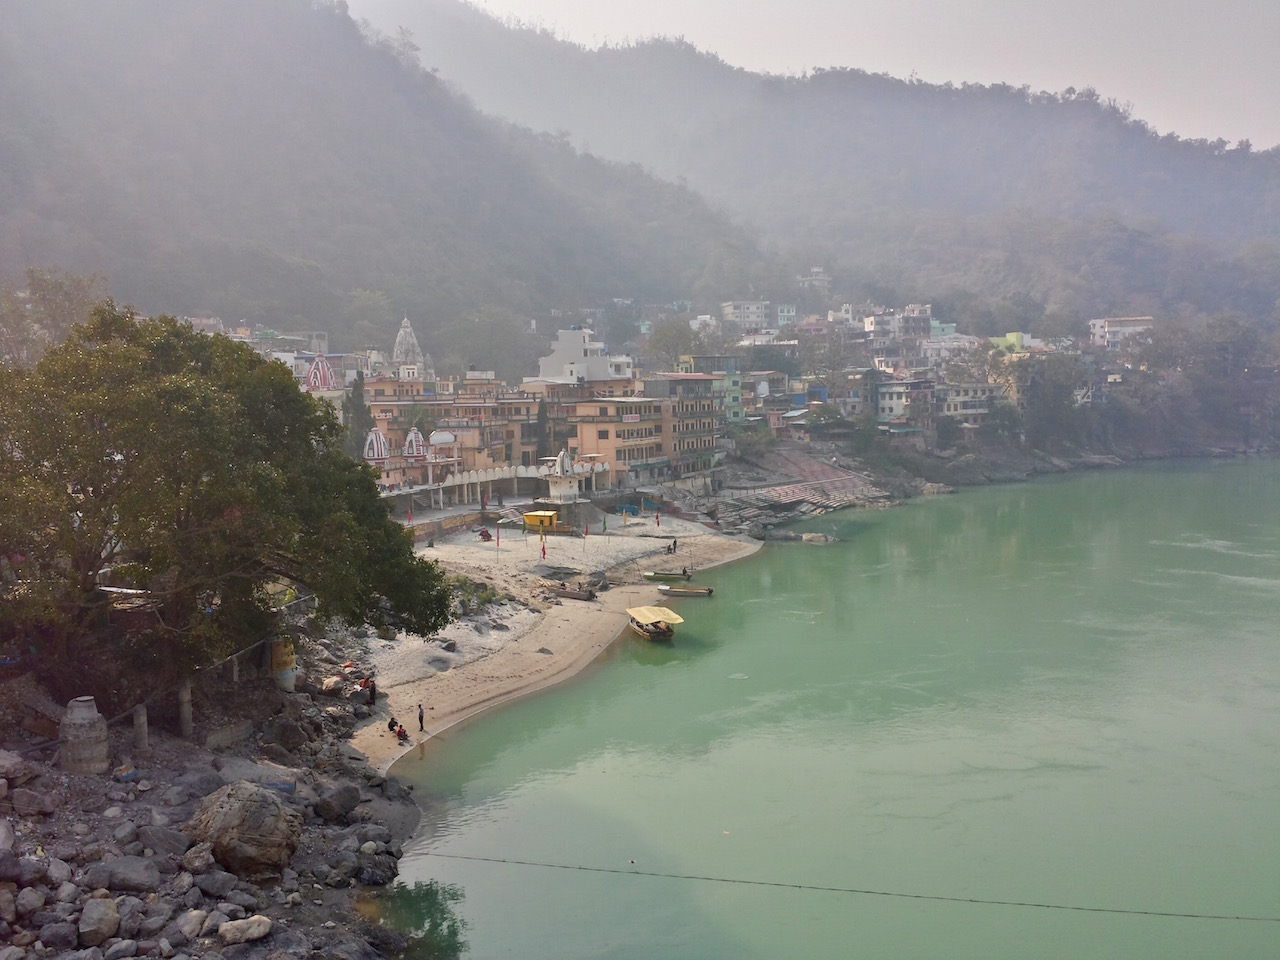 River Ganges Rishikesh India